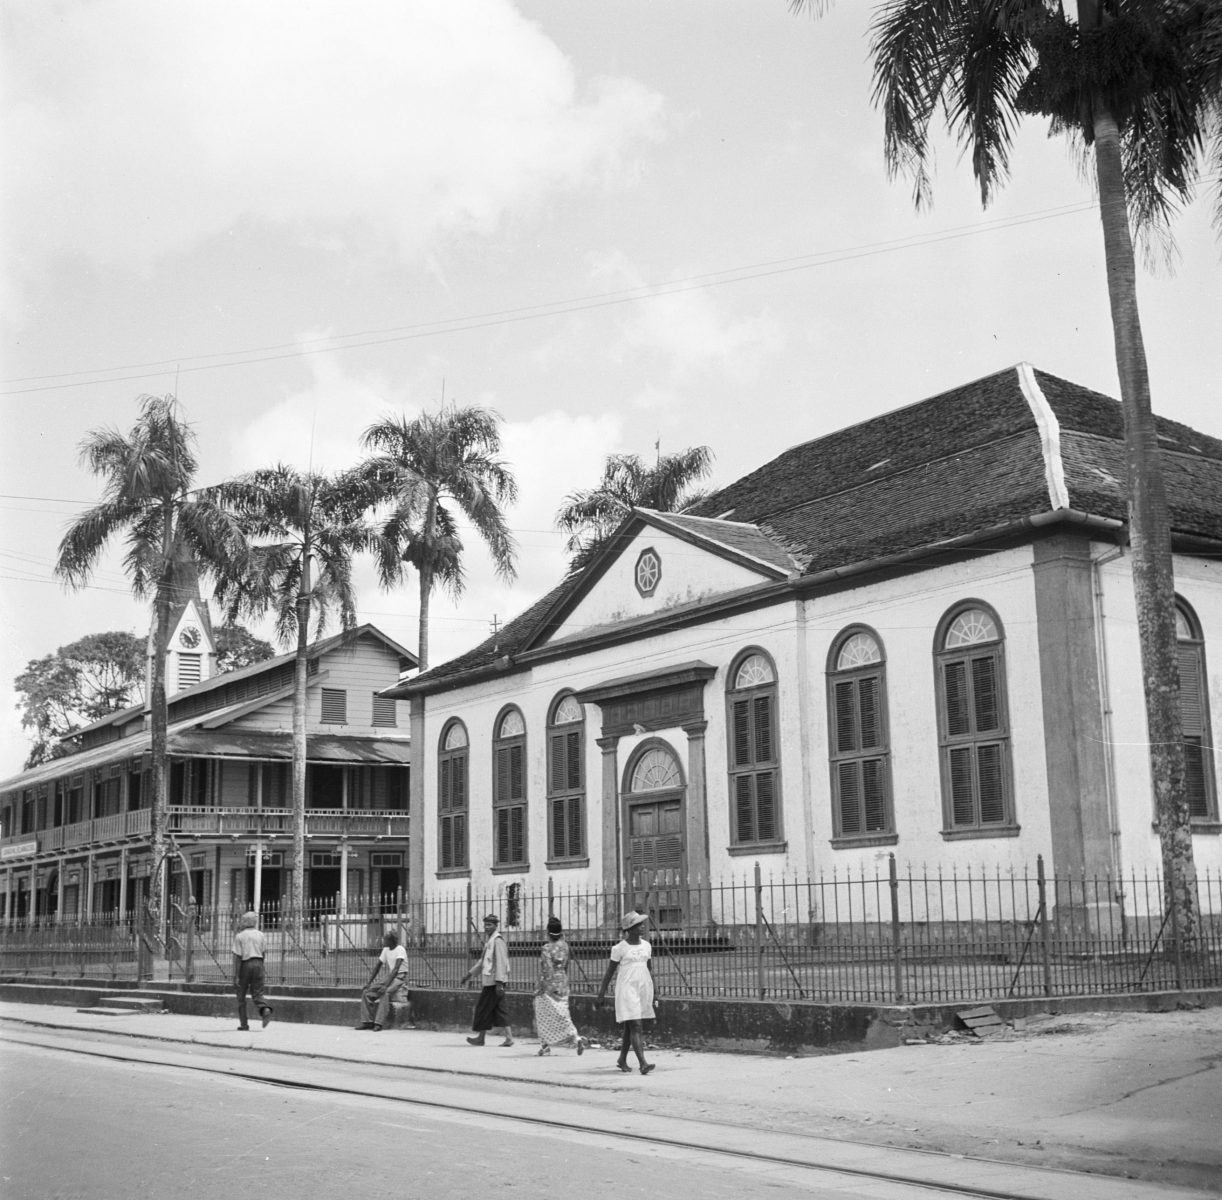 Tentoonstelling kerken en slavernij